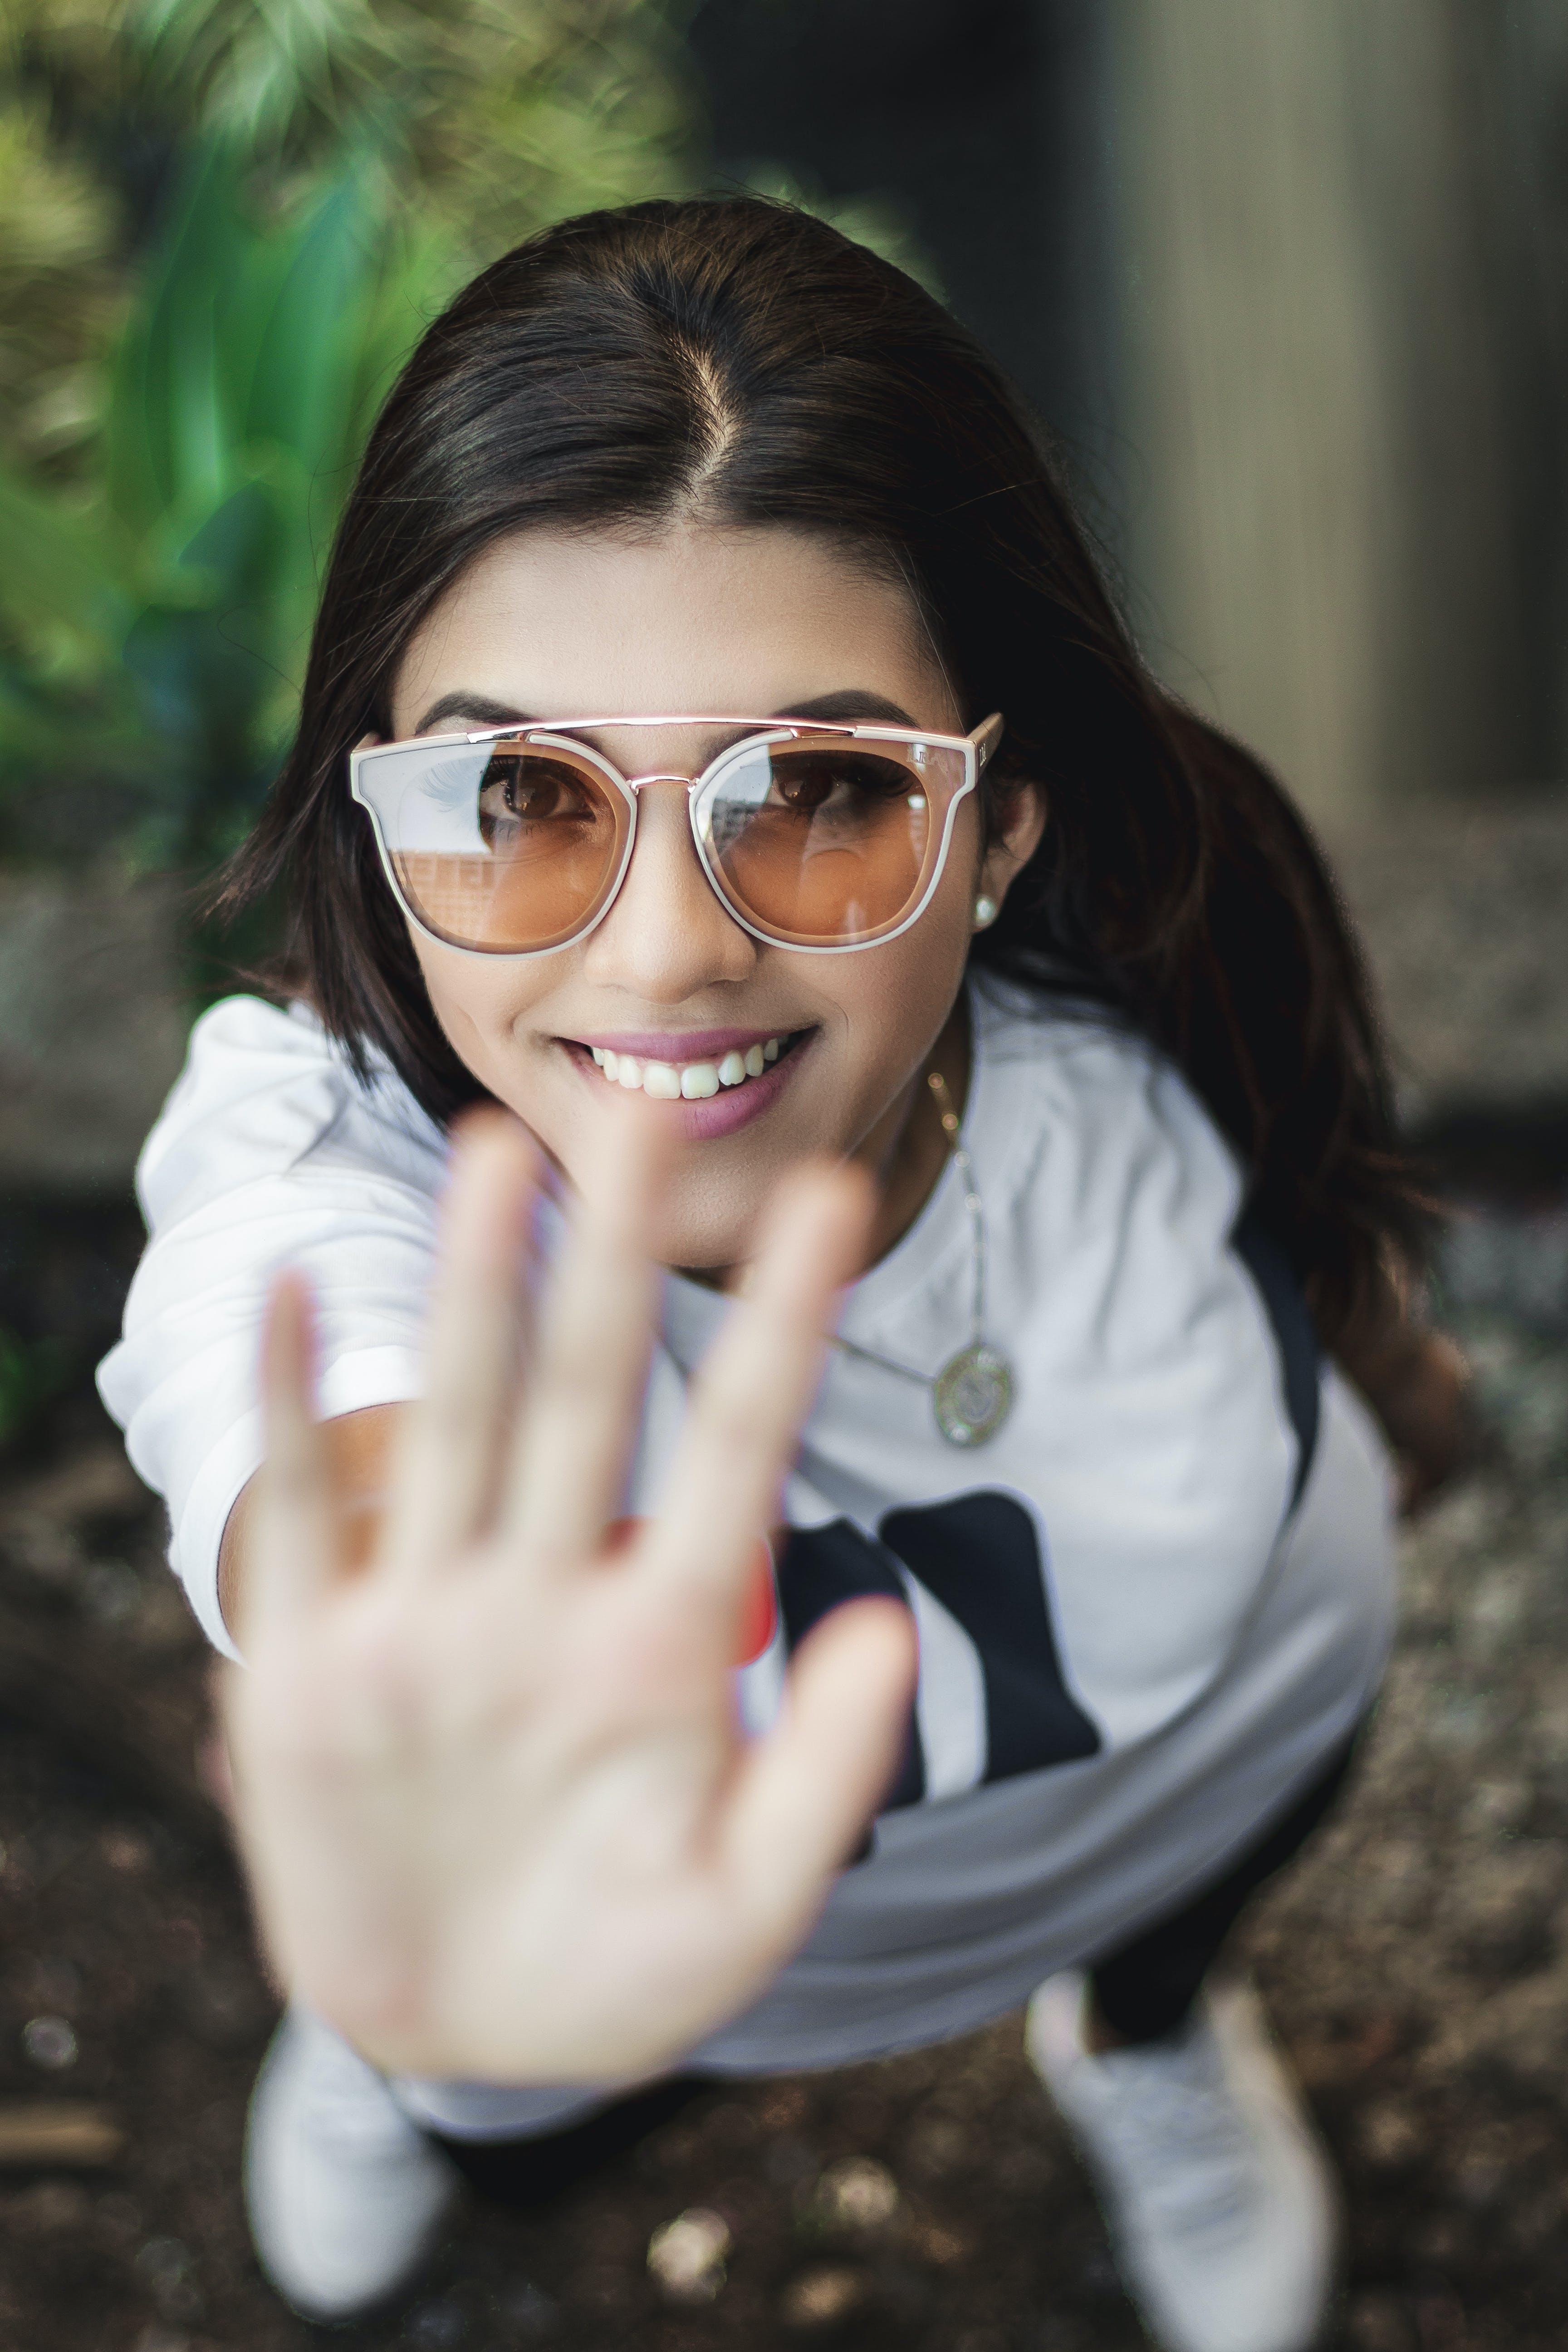 Selective Focus Photography Of Woman Raising Hand